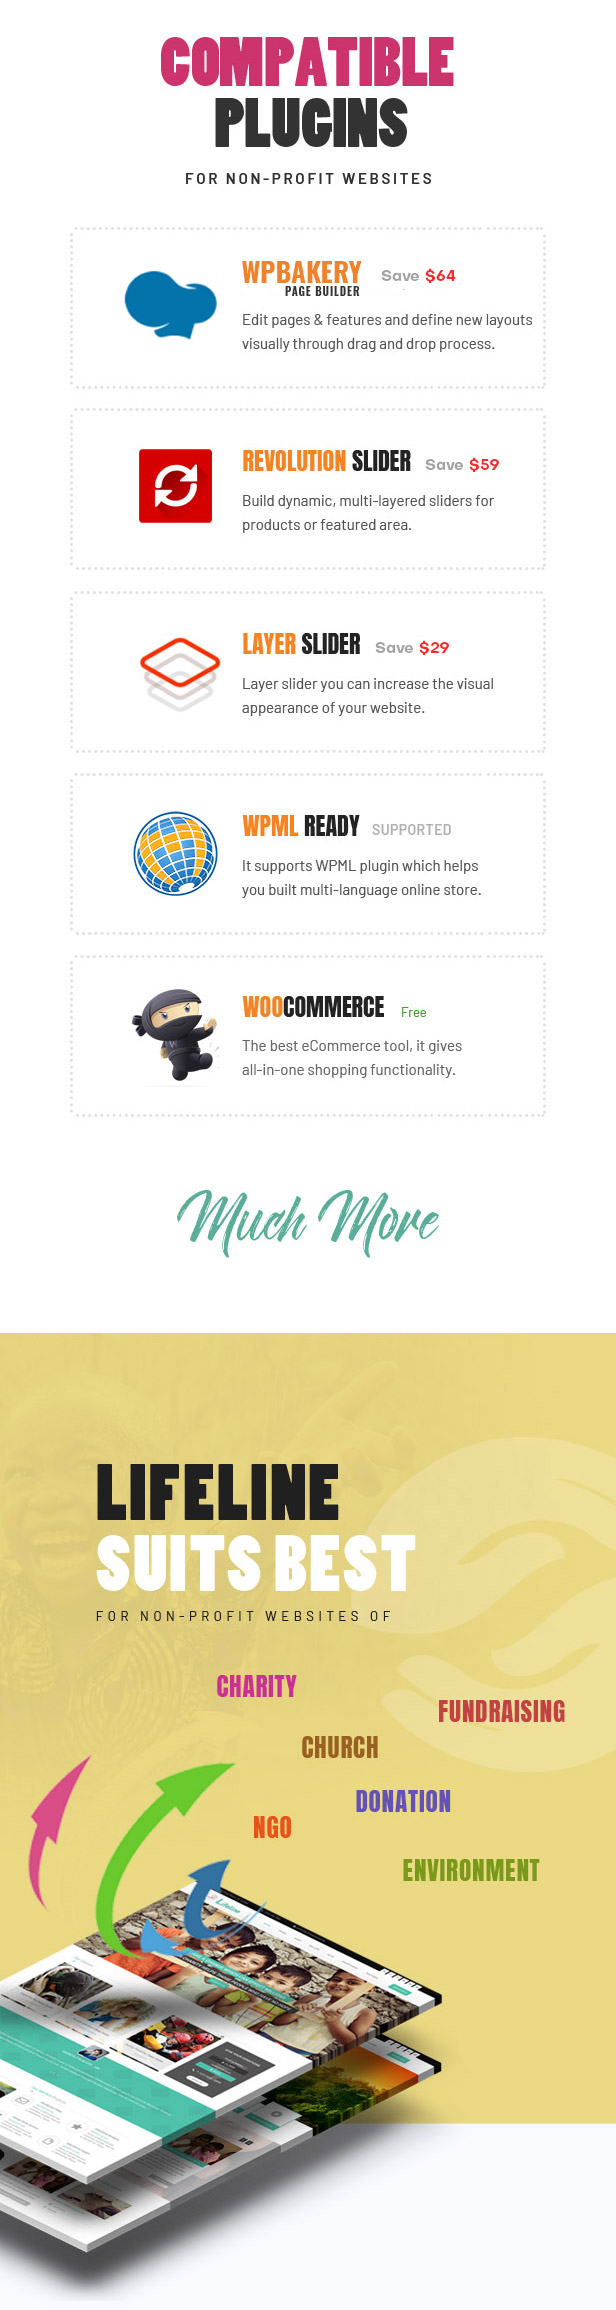 Lifeline - NGO, Fund Raising and Charity WordPress Theme - 3